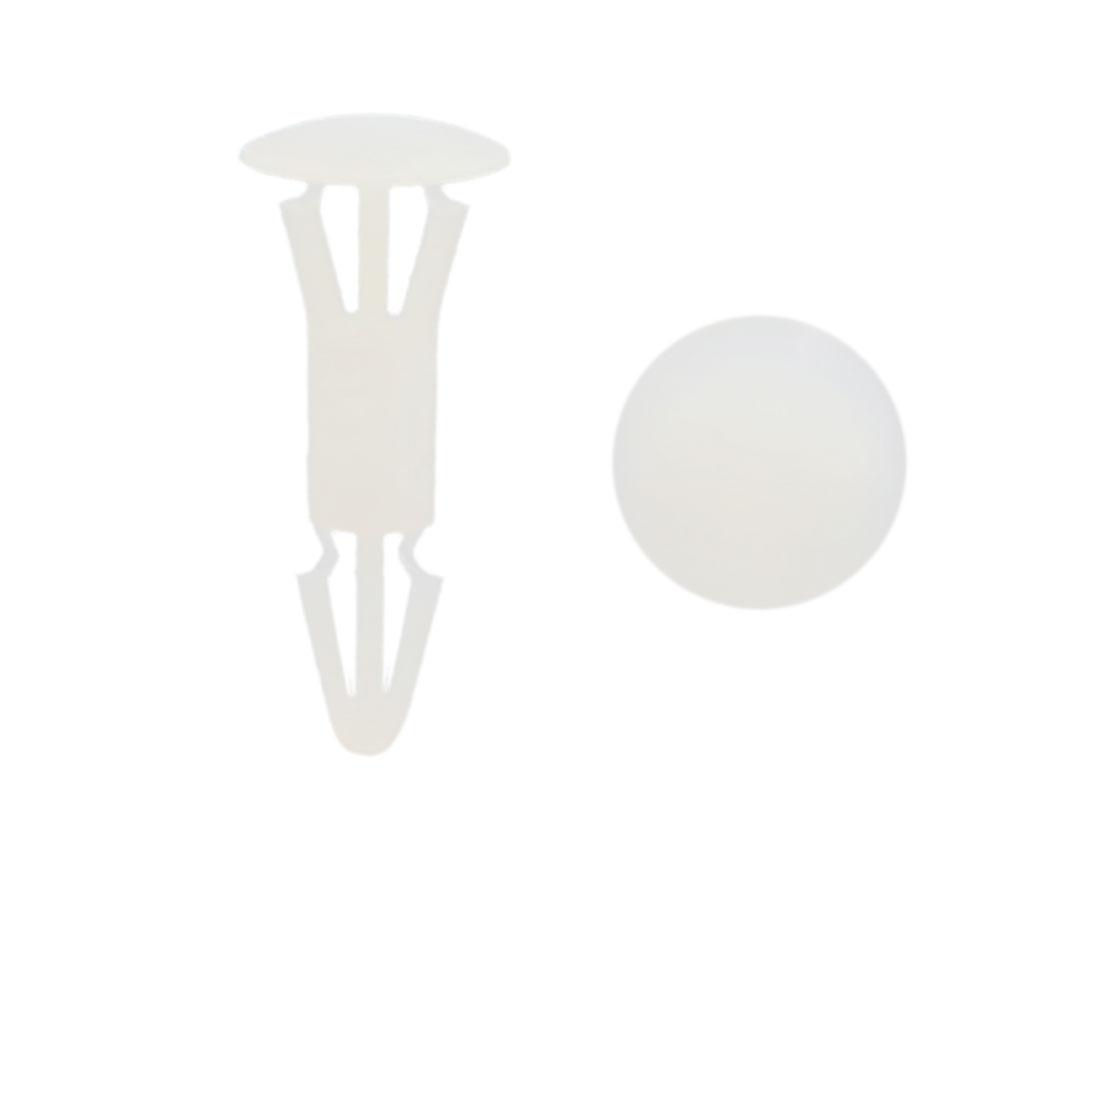 200pcs Universal White Plastic Fasteners Clips Rivet for Car Auto Bumper Fender